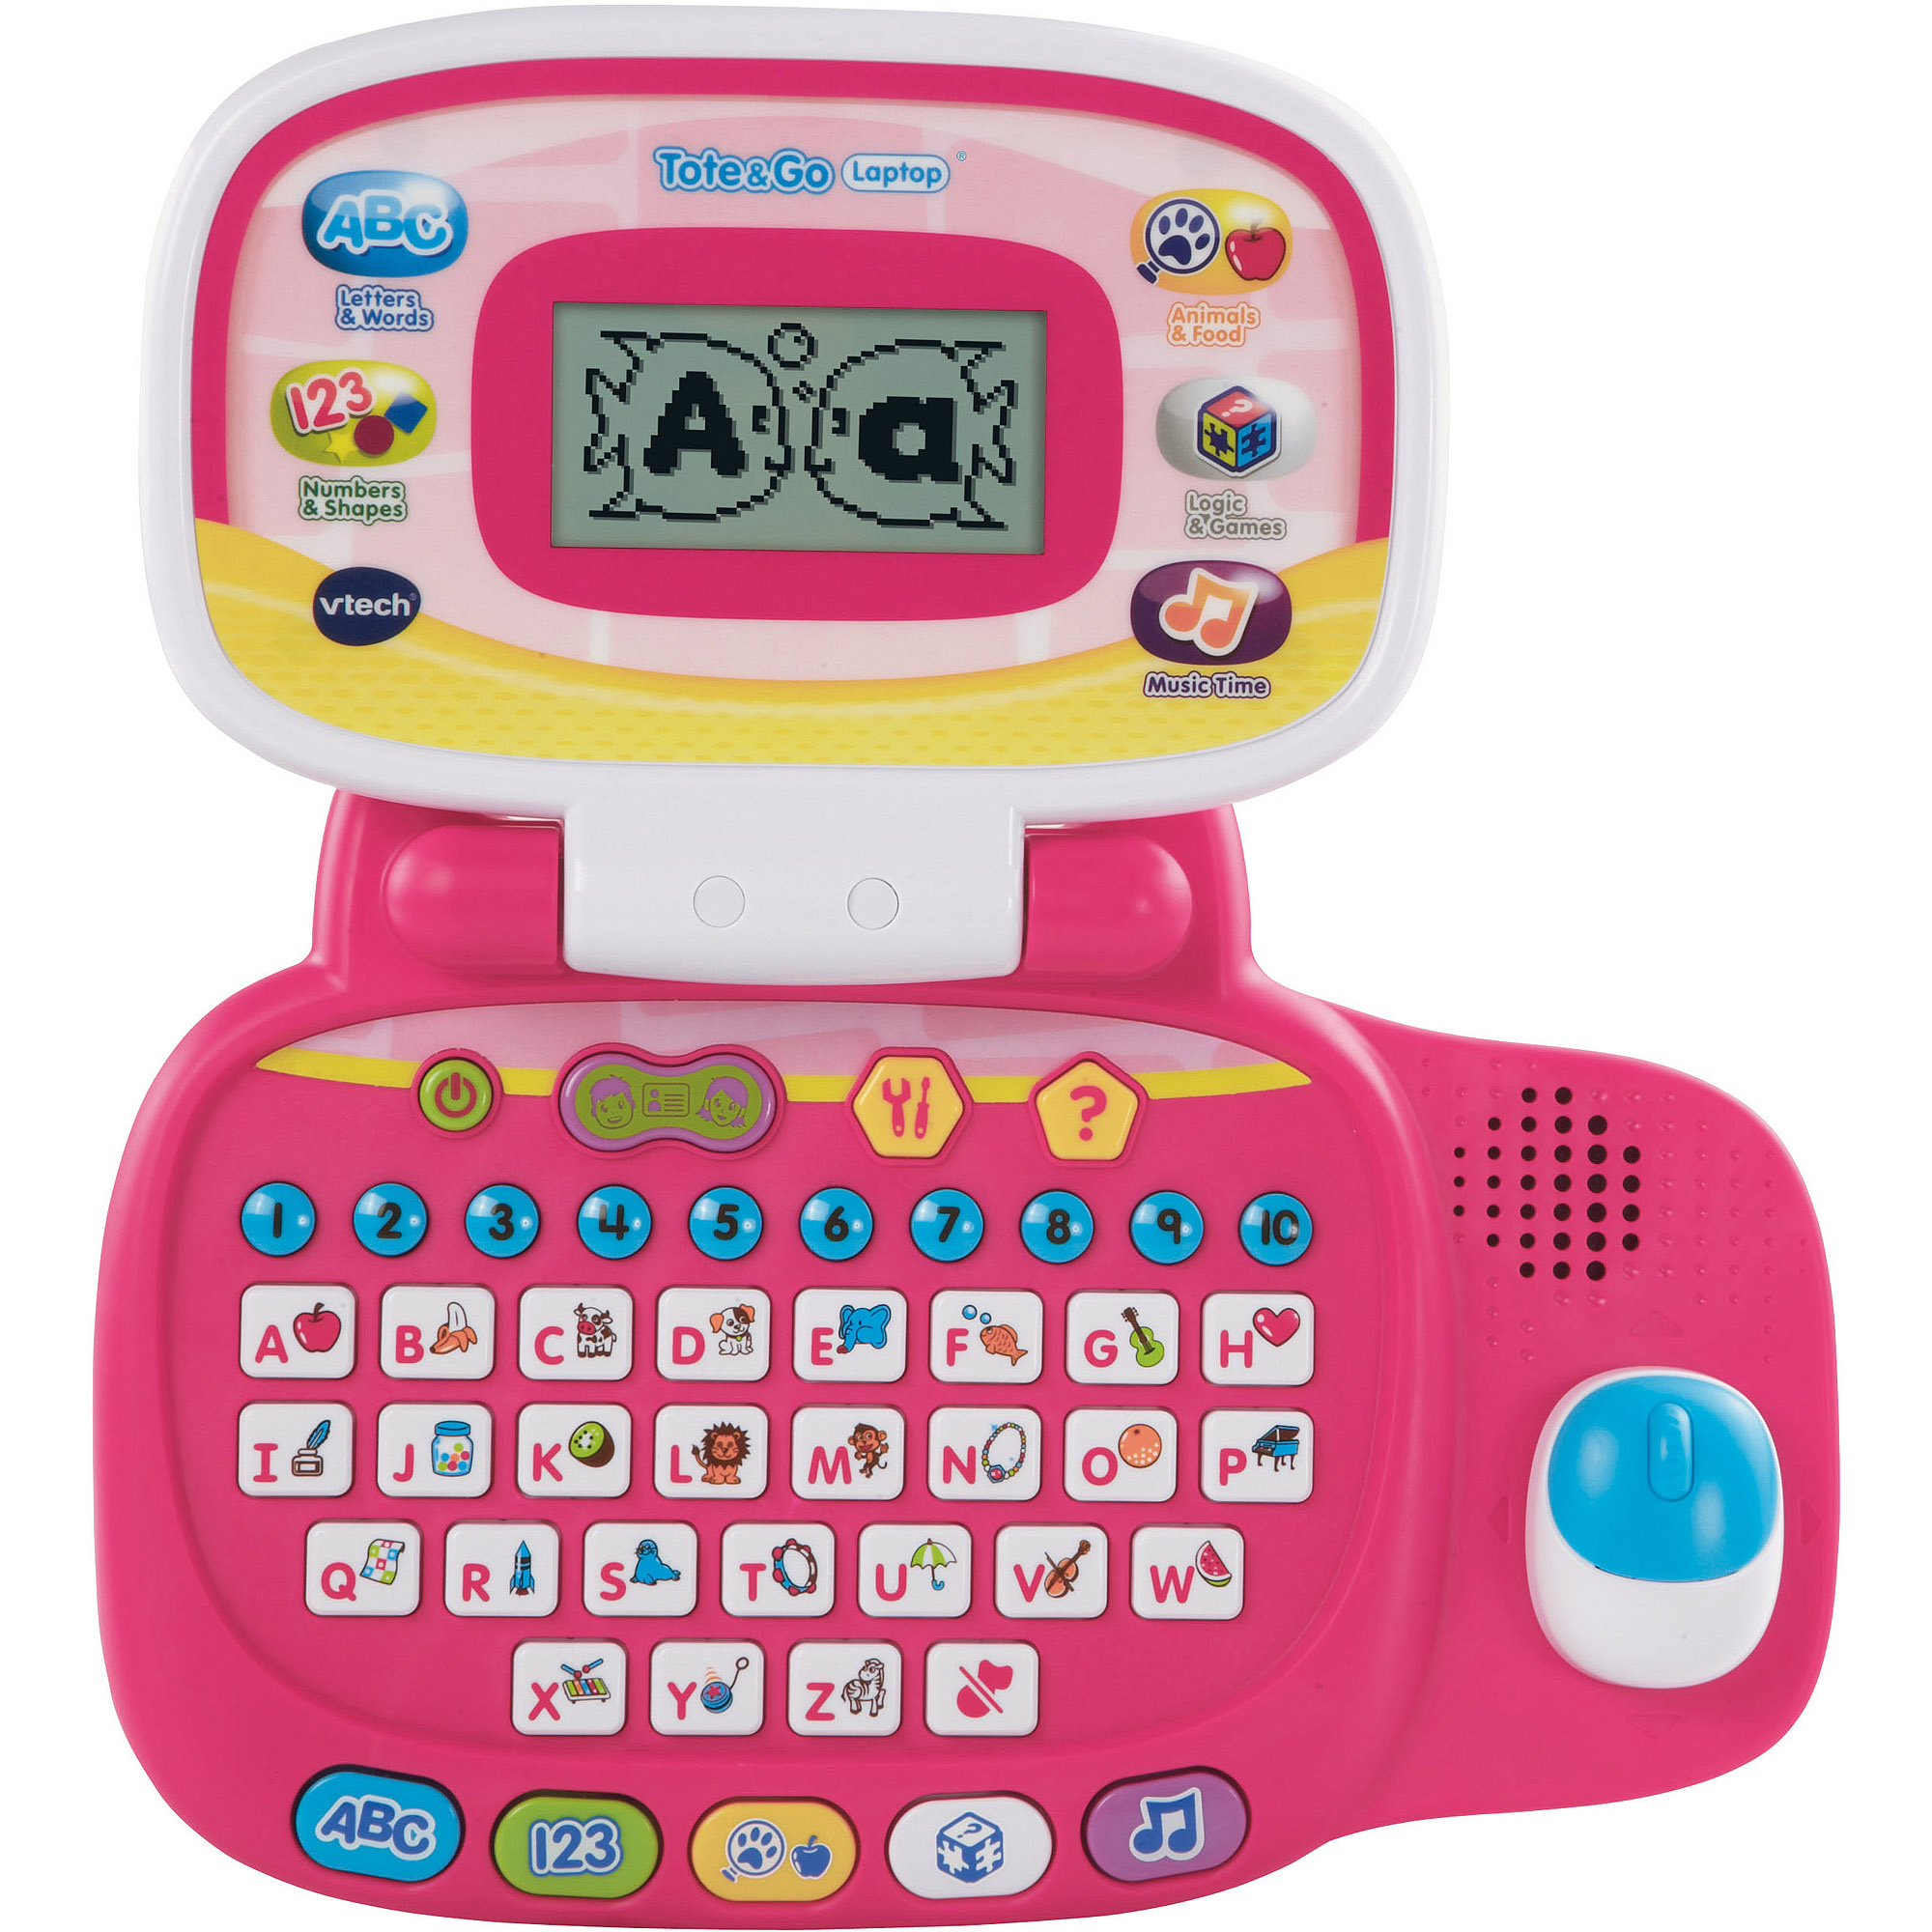 Tote & Go Laptop Pink Walmart